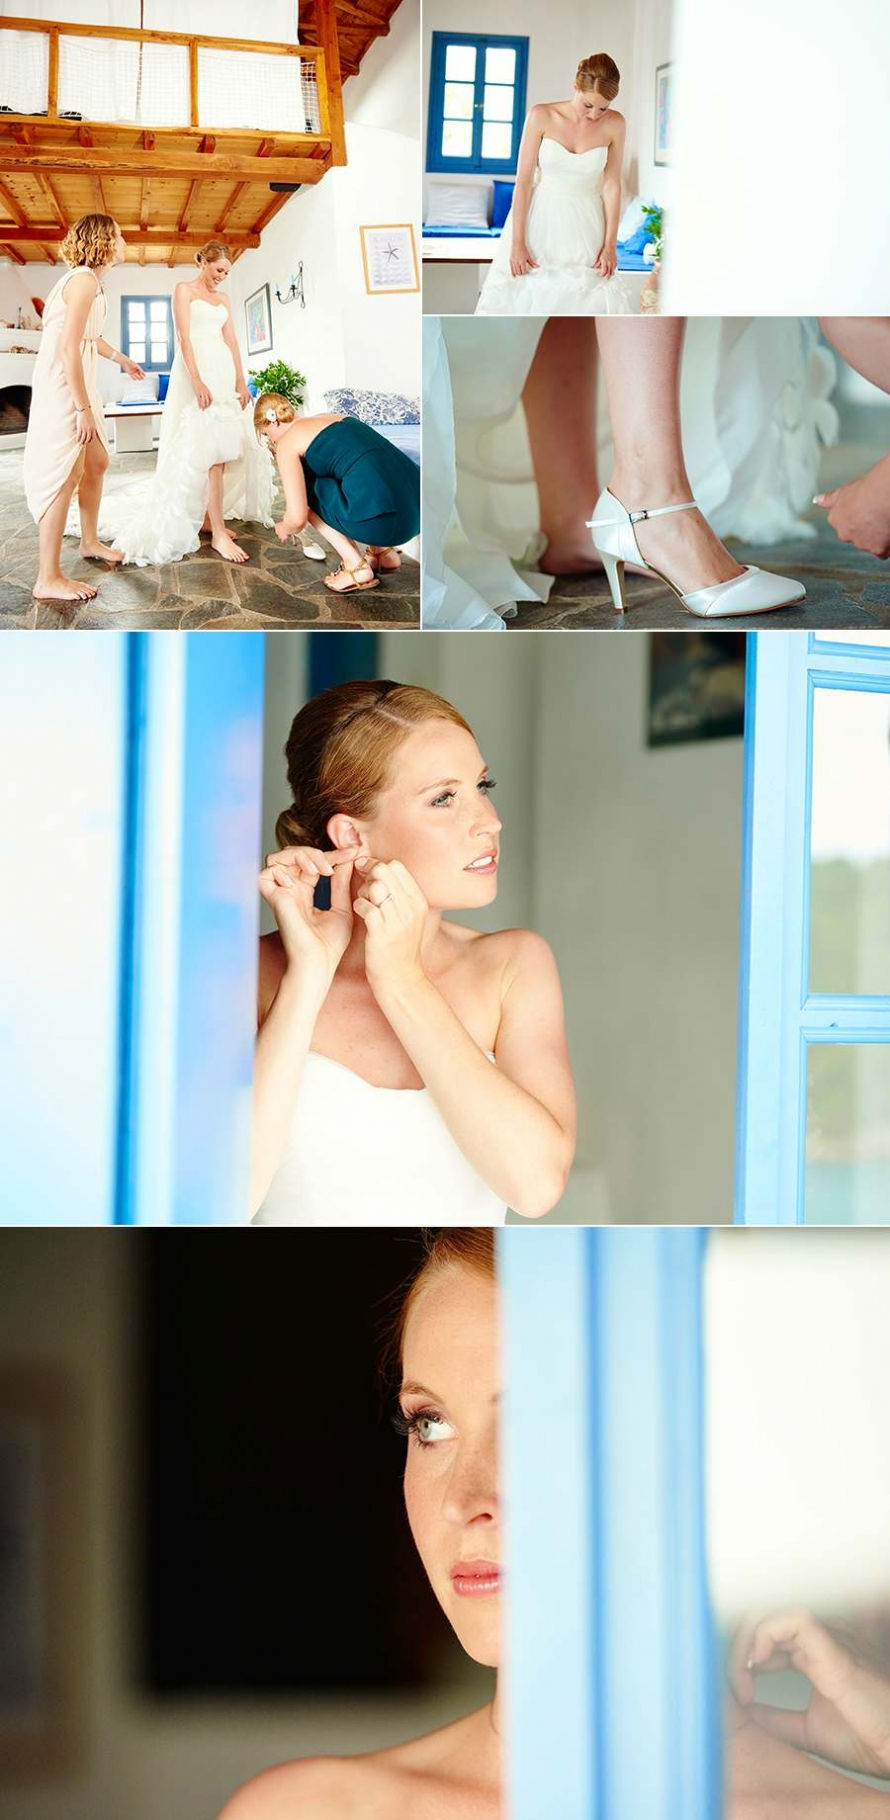 Tobi & Vanessa wedding photos 09